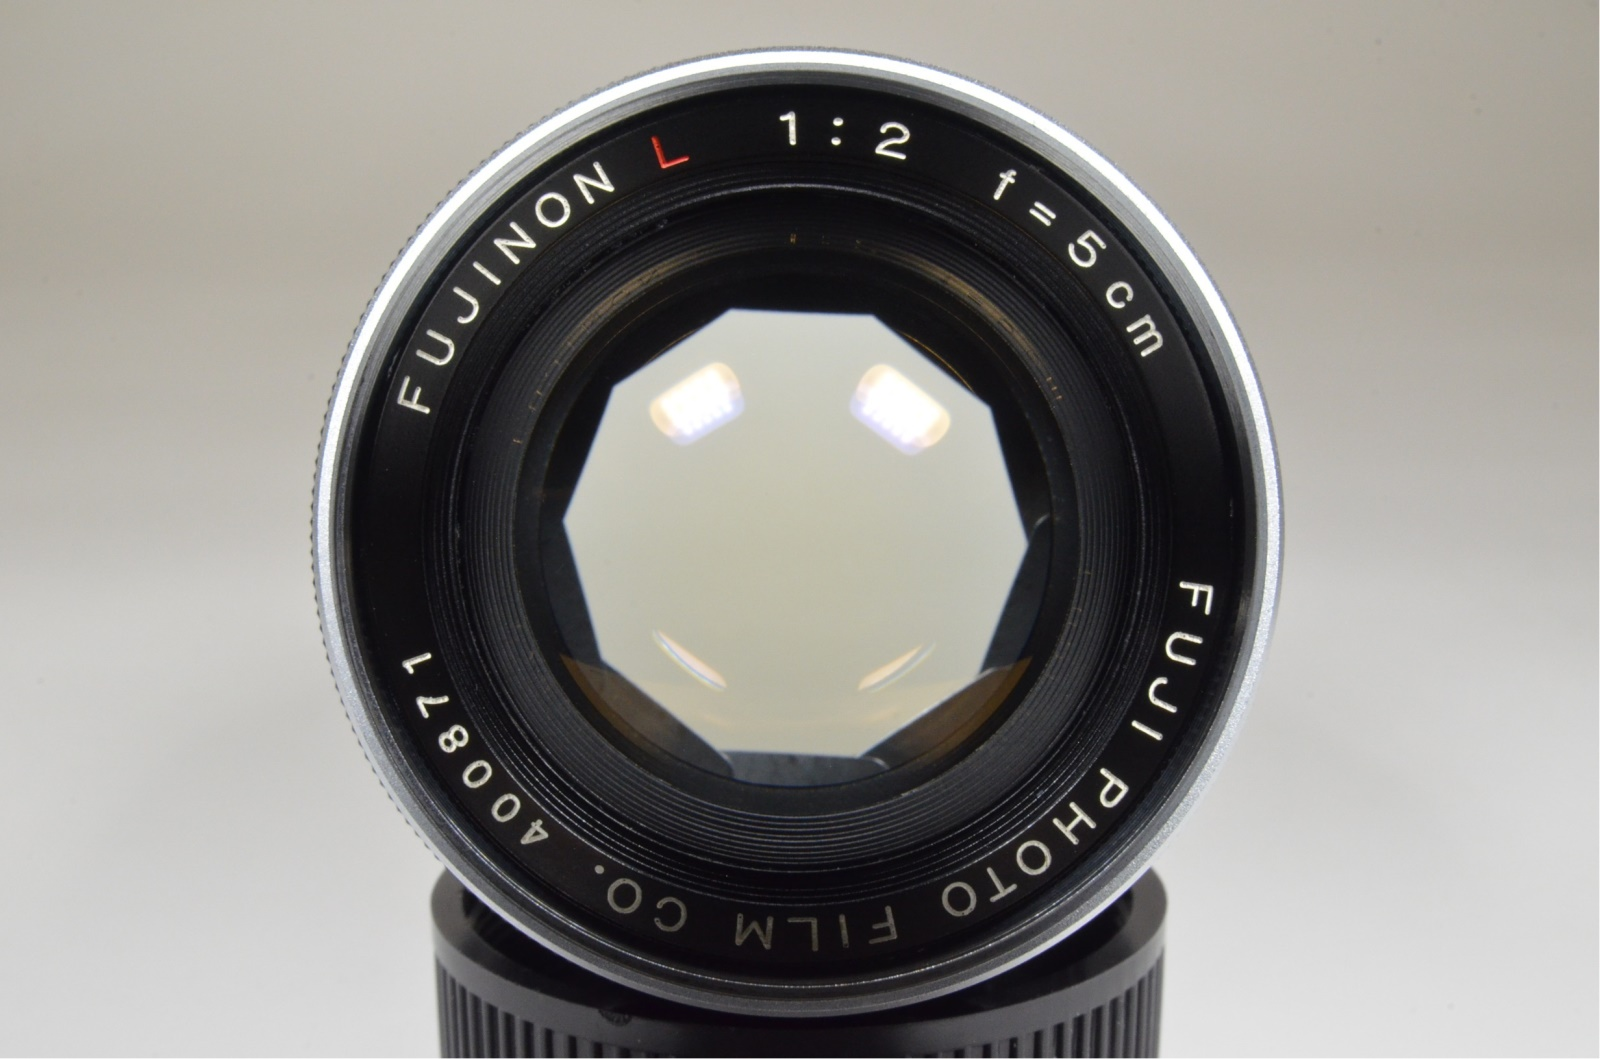 fuji fujinon 50mm 5cm f2 l mount lens for leica m39 l39 ltm from japan